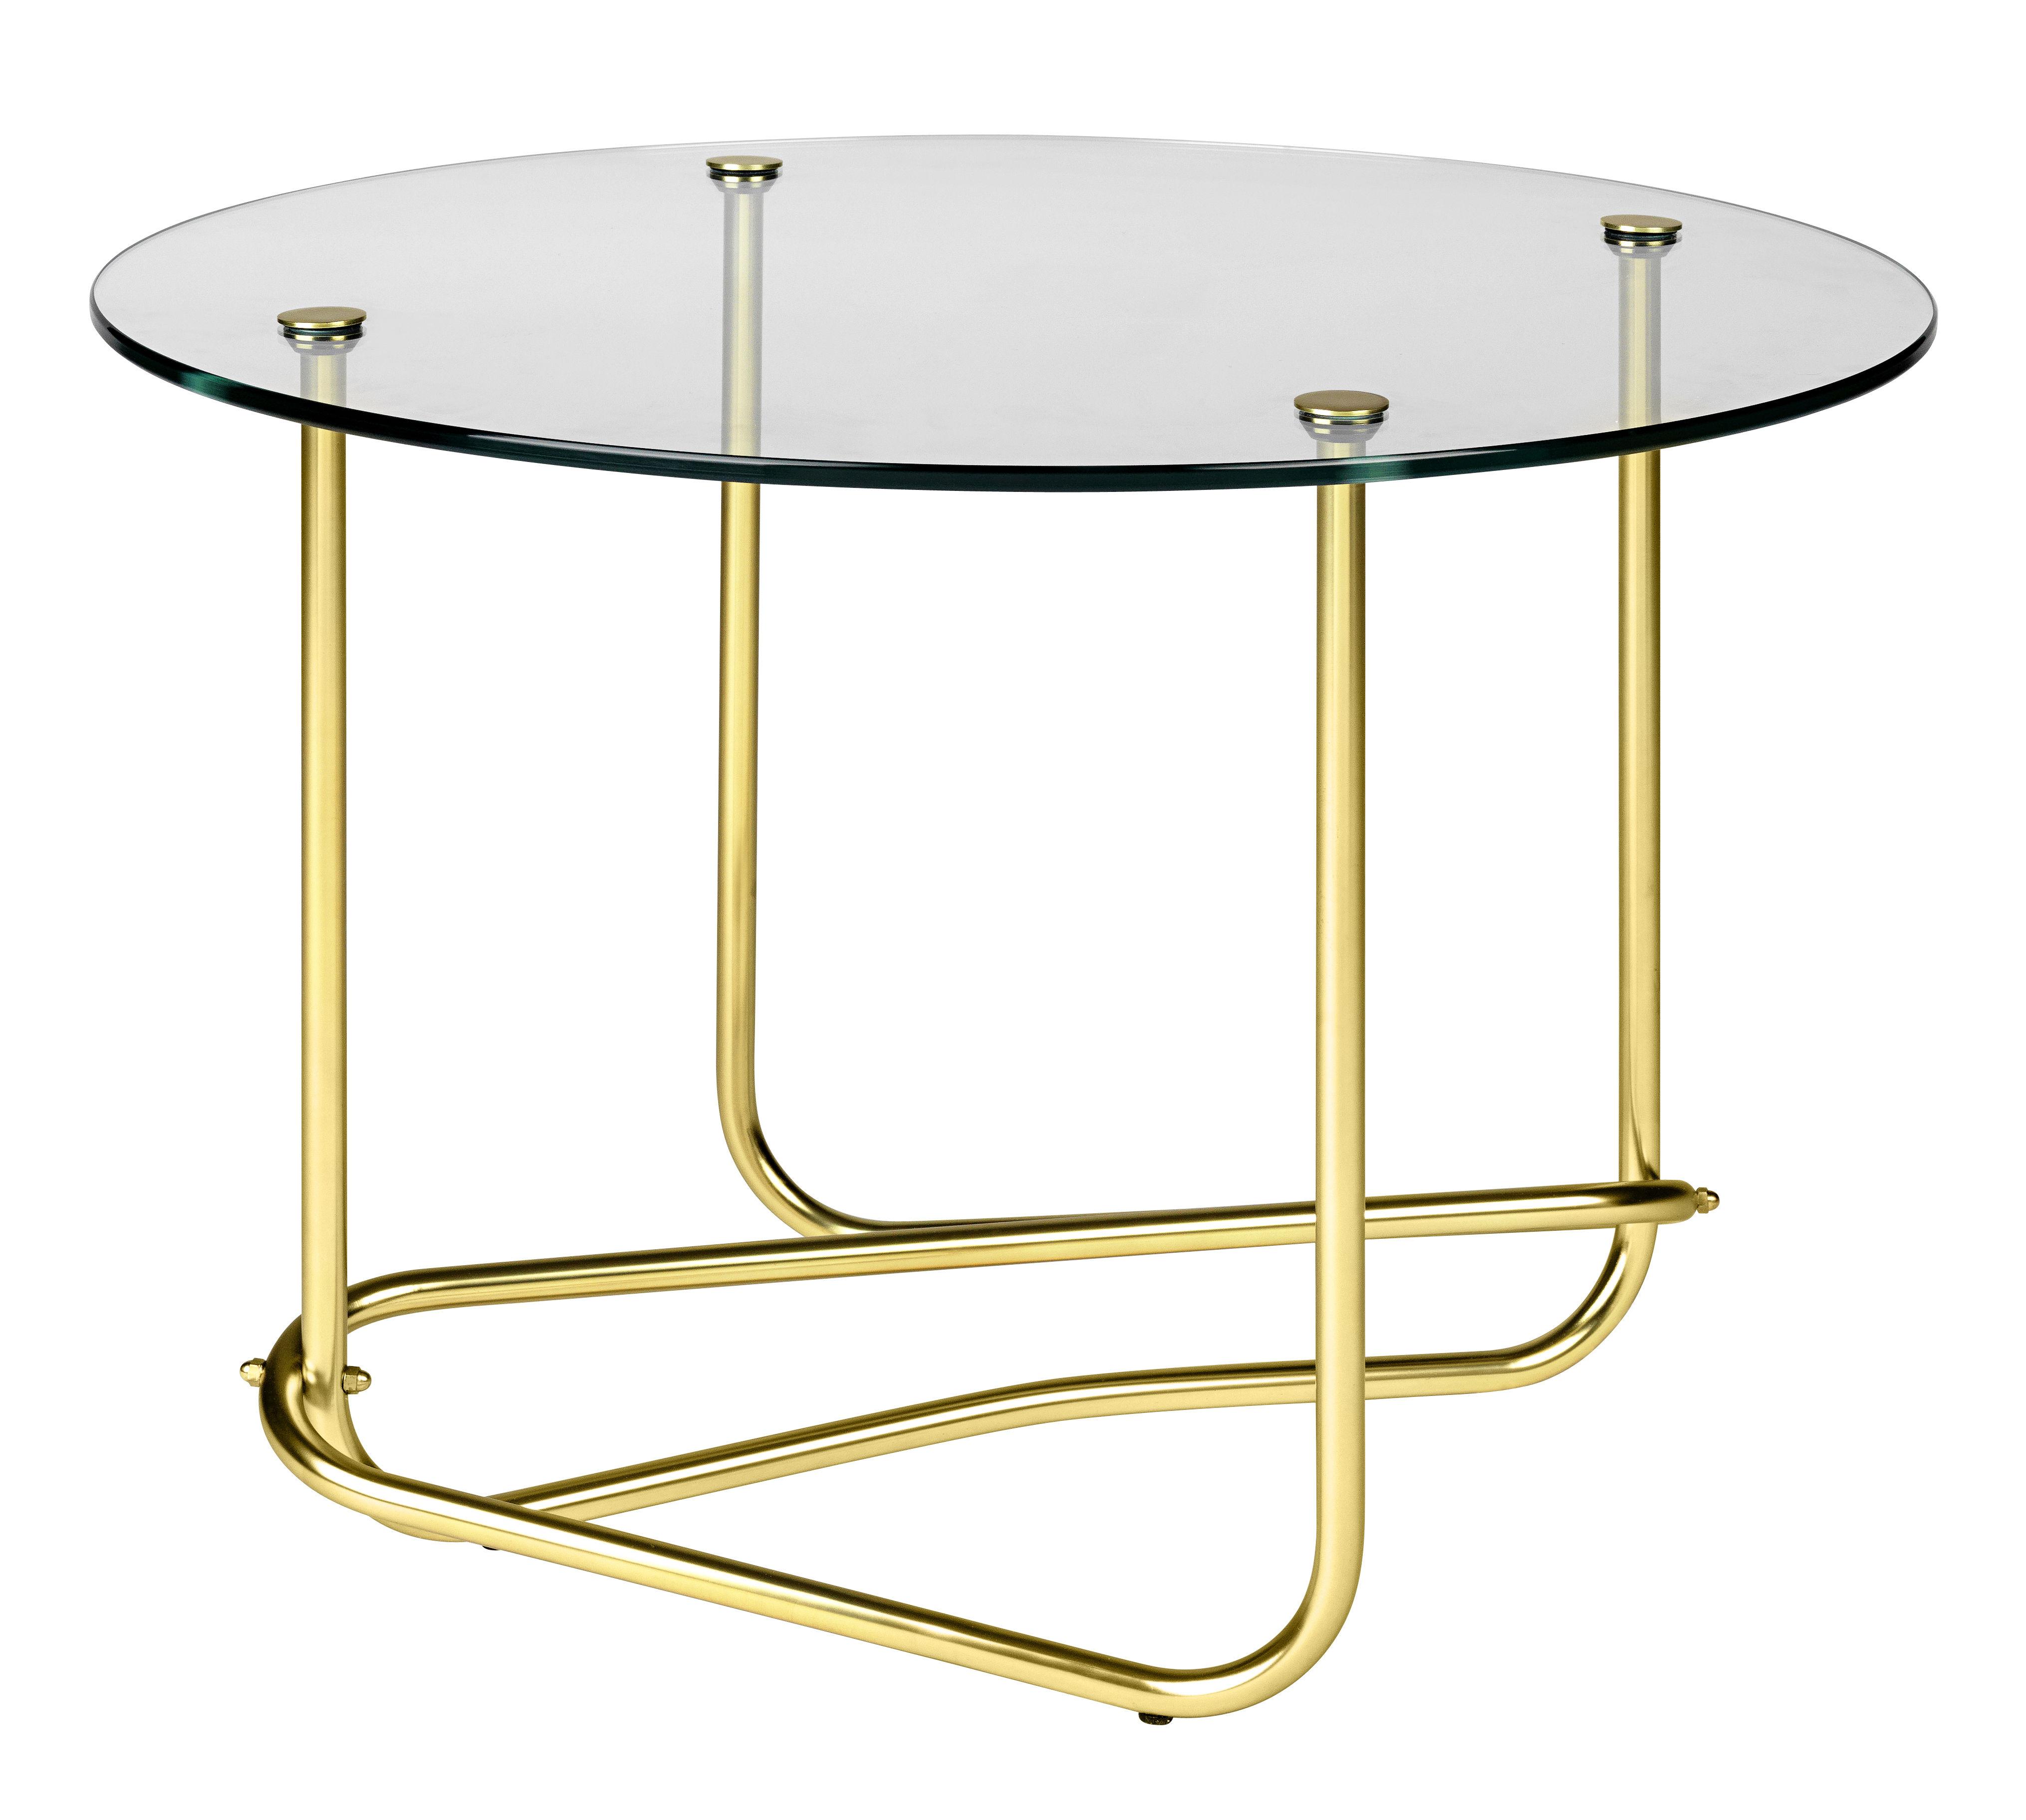 Furniture - Coffee Tables - Lounge Table Coffee table - Matégot / Ø 41 x H 58 cm by Gubi - Transparent top / Brass leg - Brass, Glass